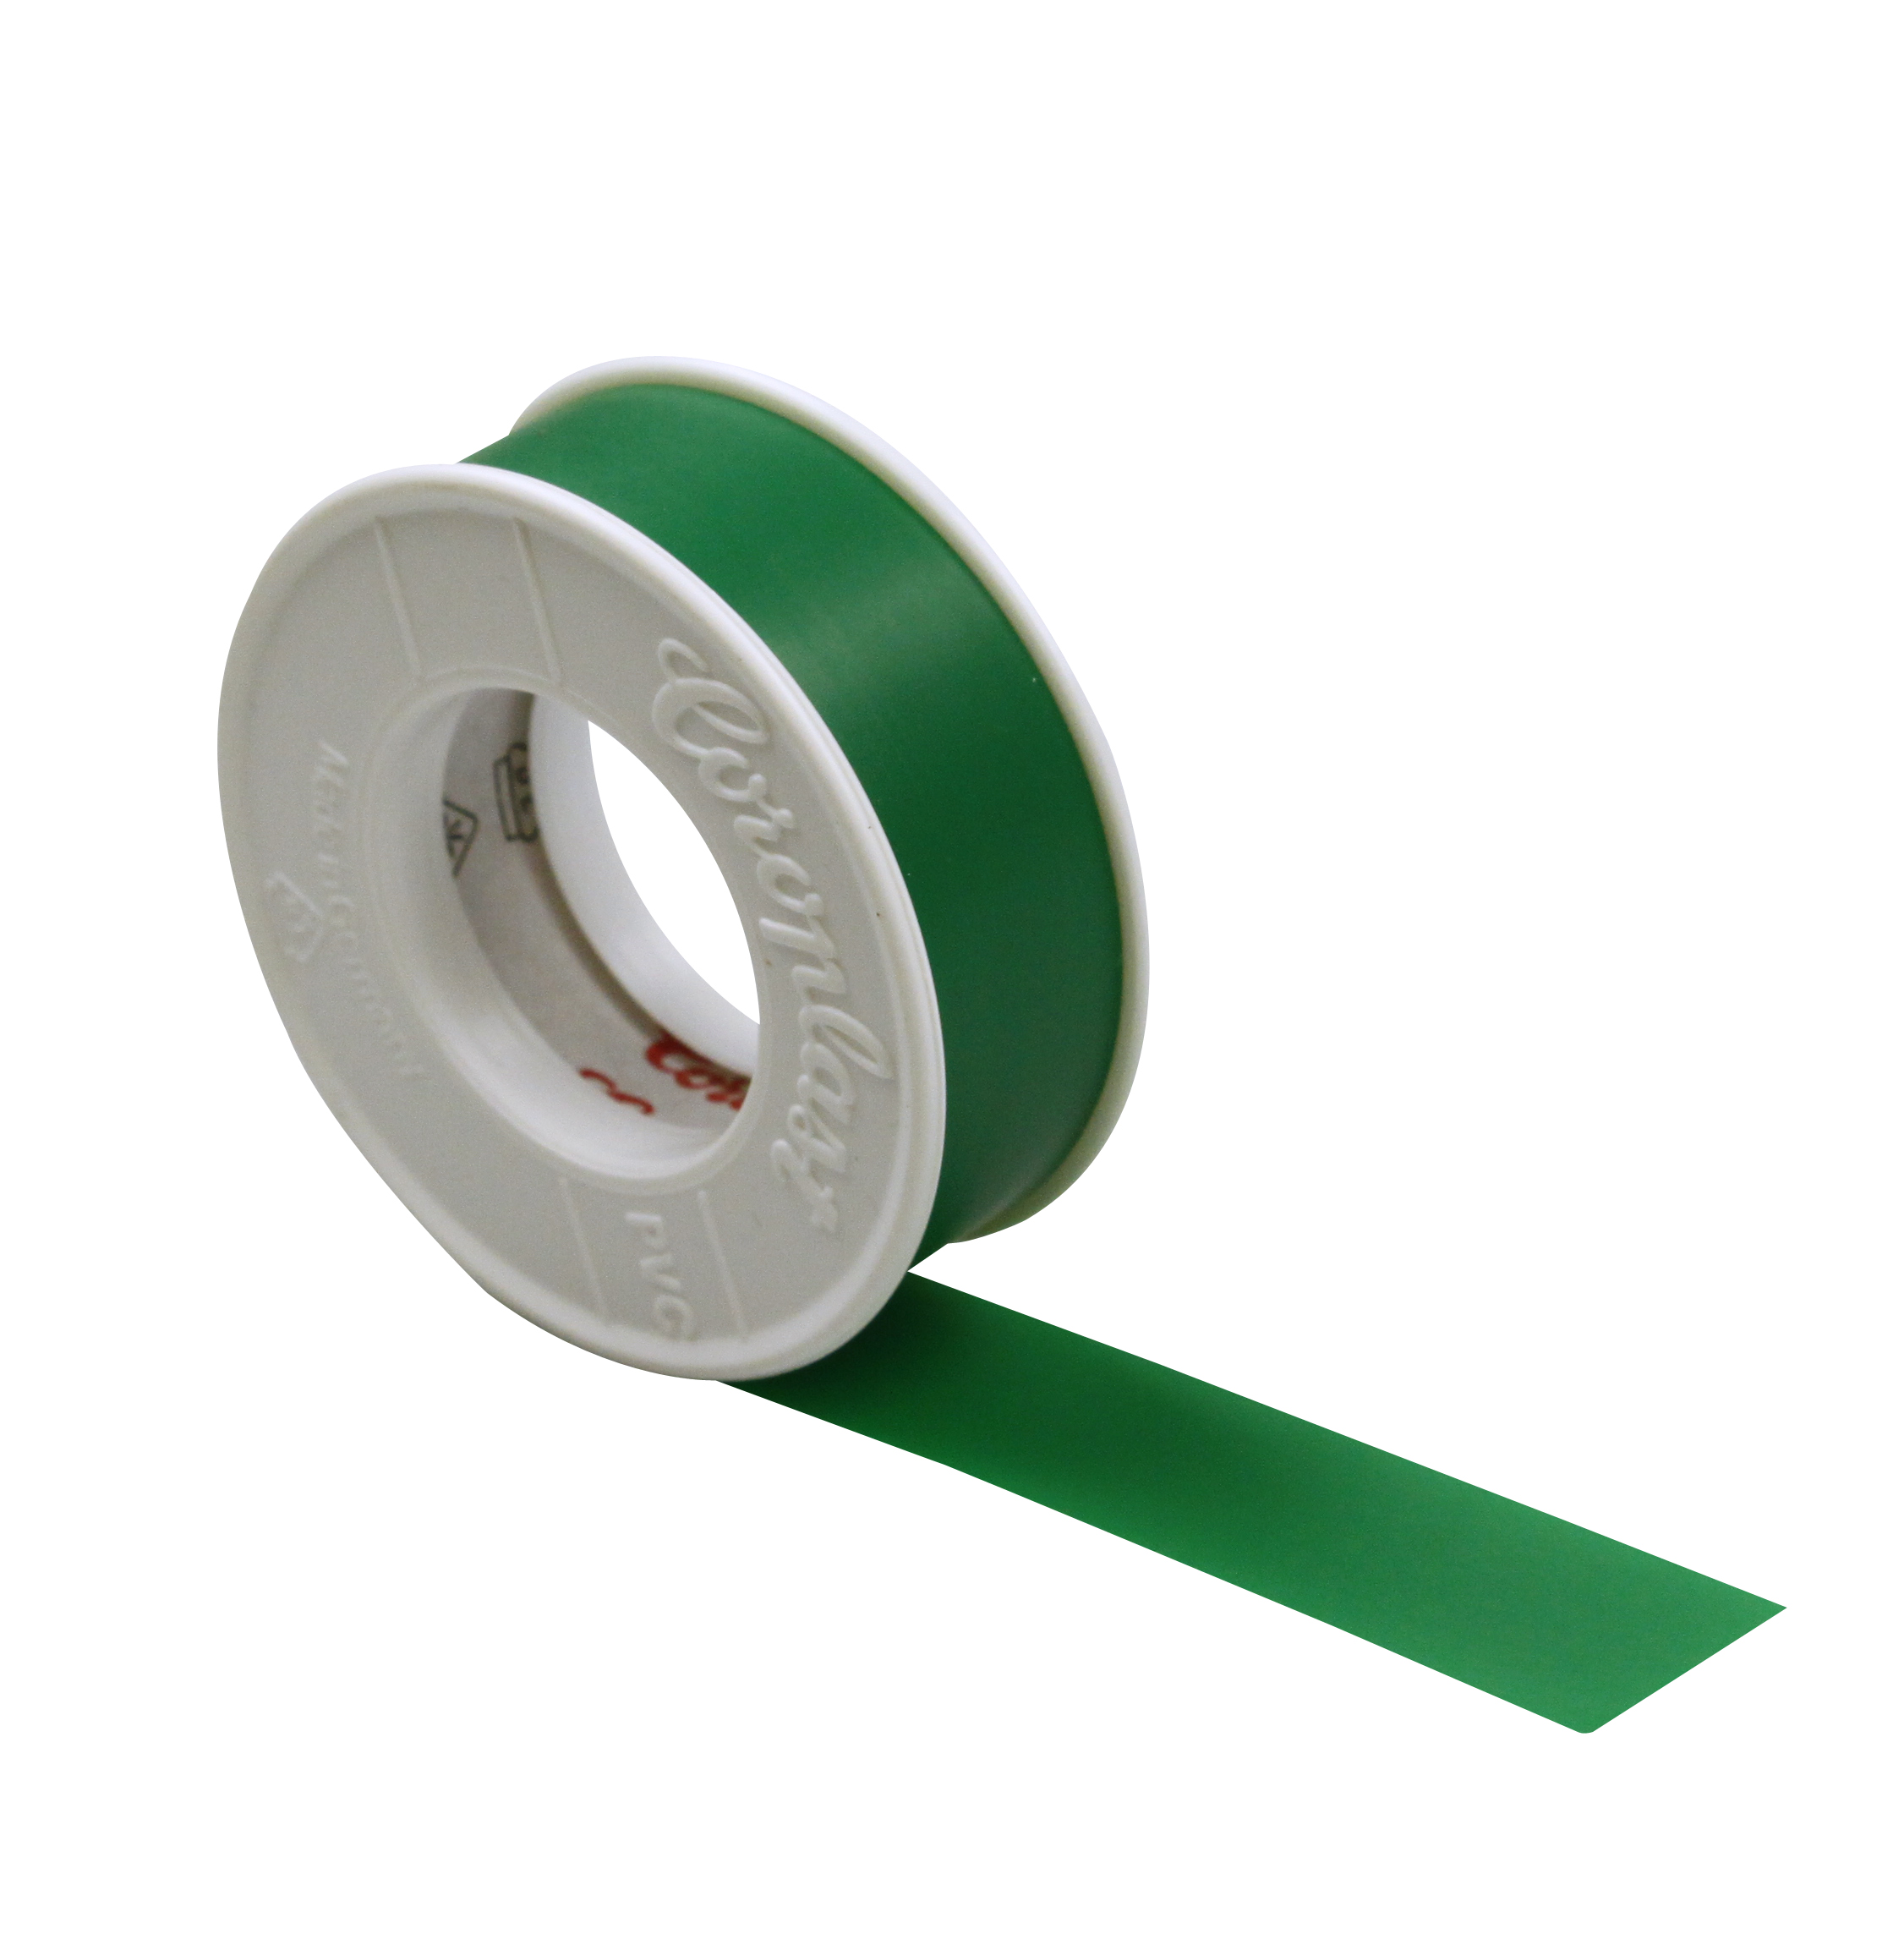 1 Stk Isolierband grün 15mm x 10m-Coroplast GI98530902